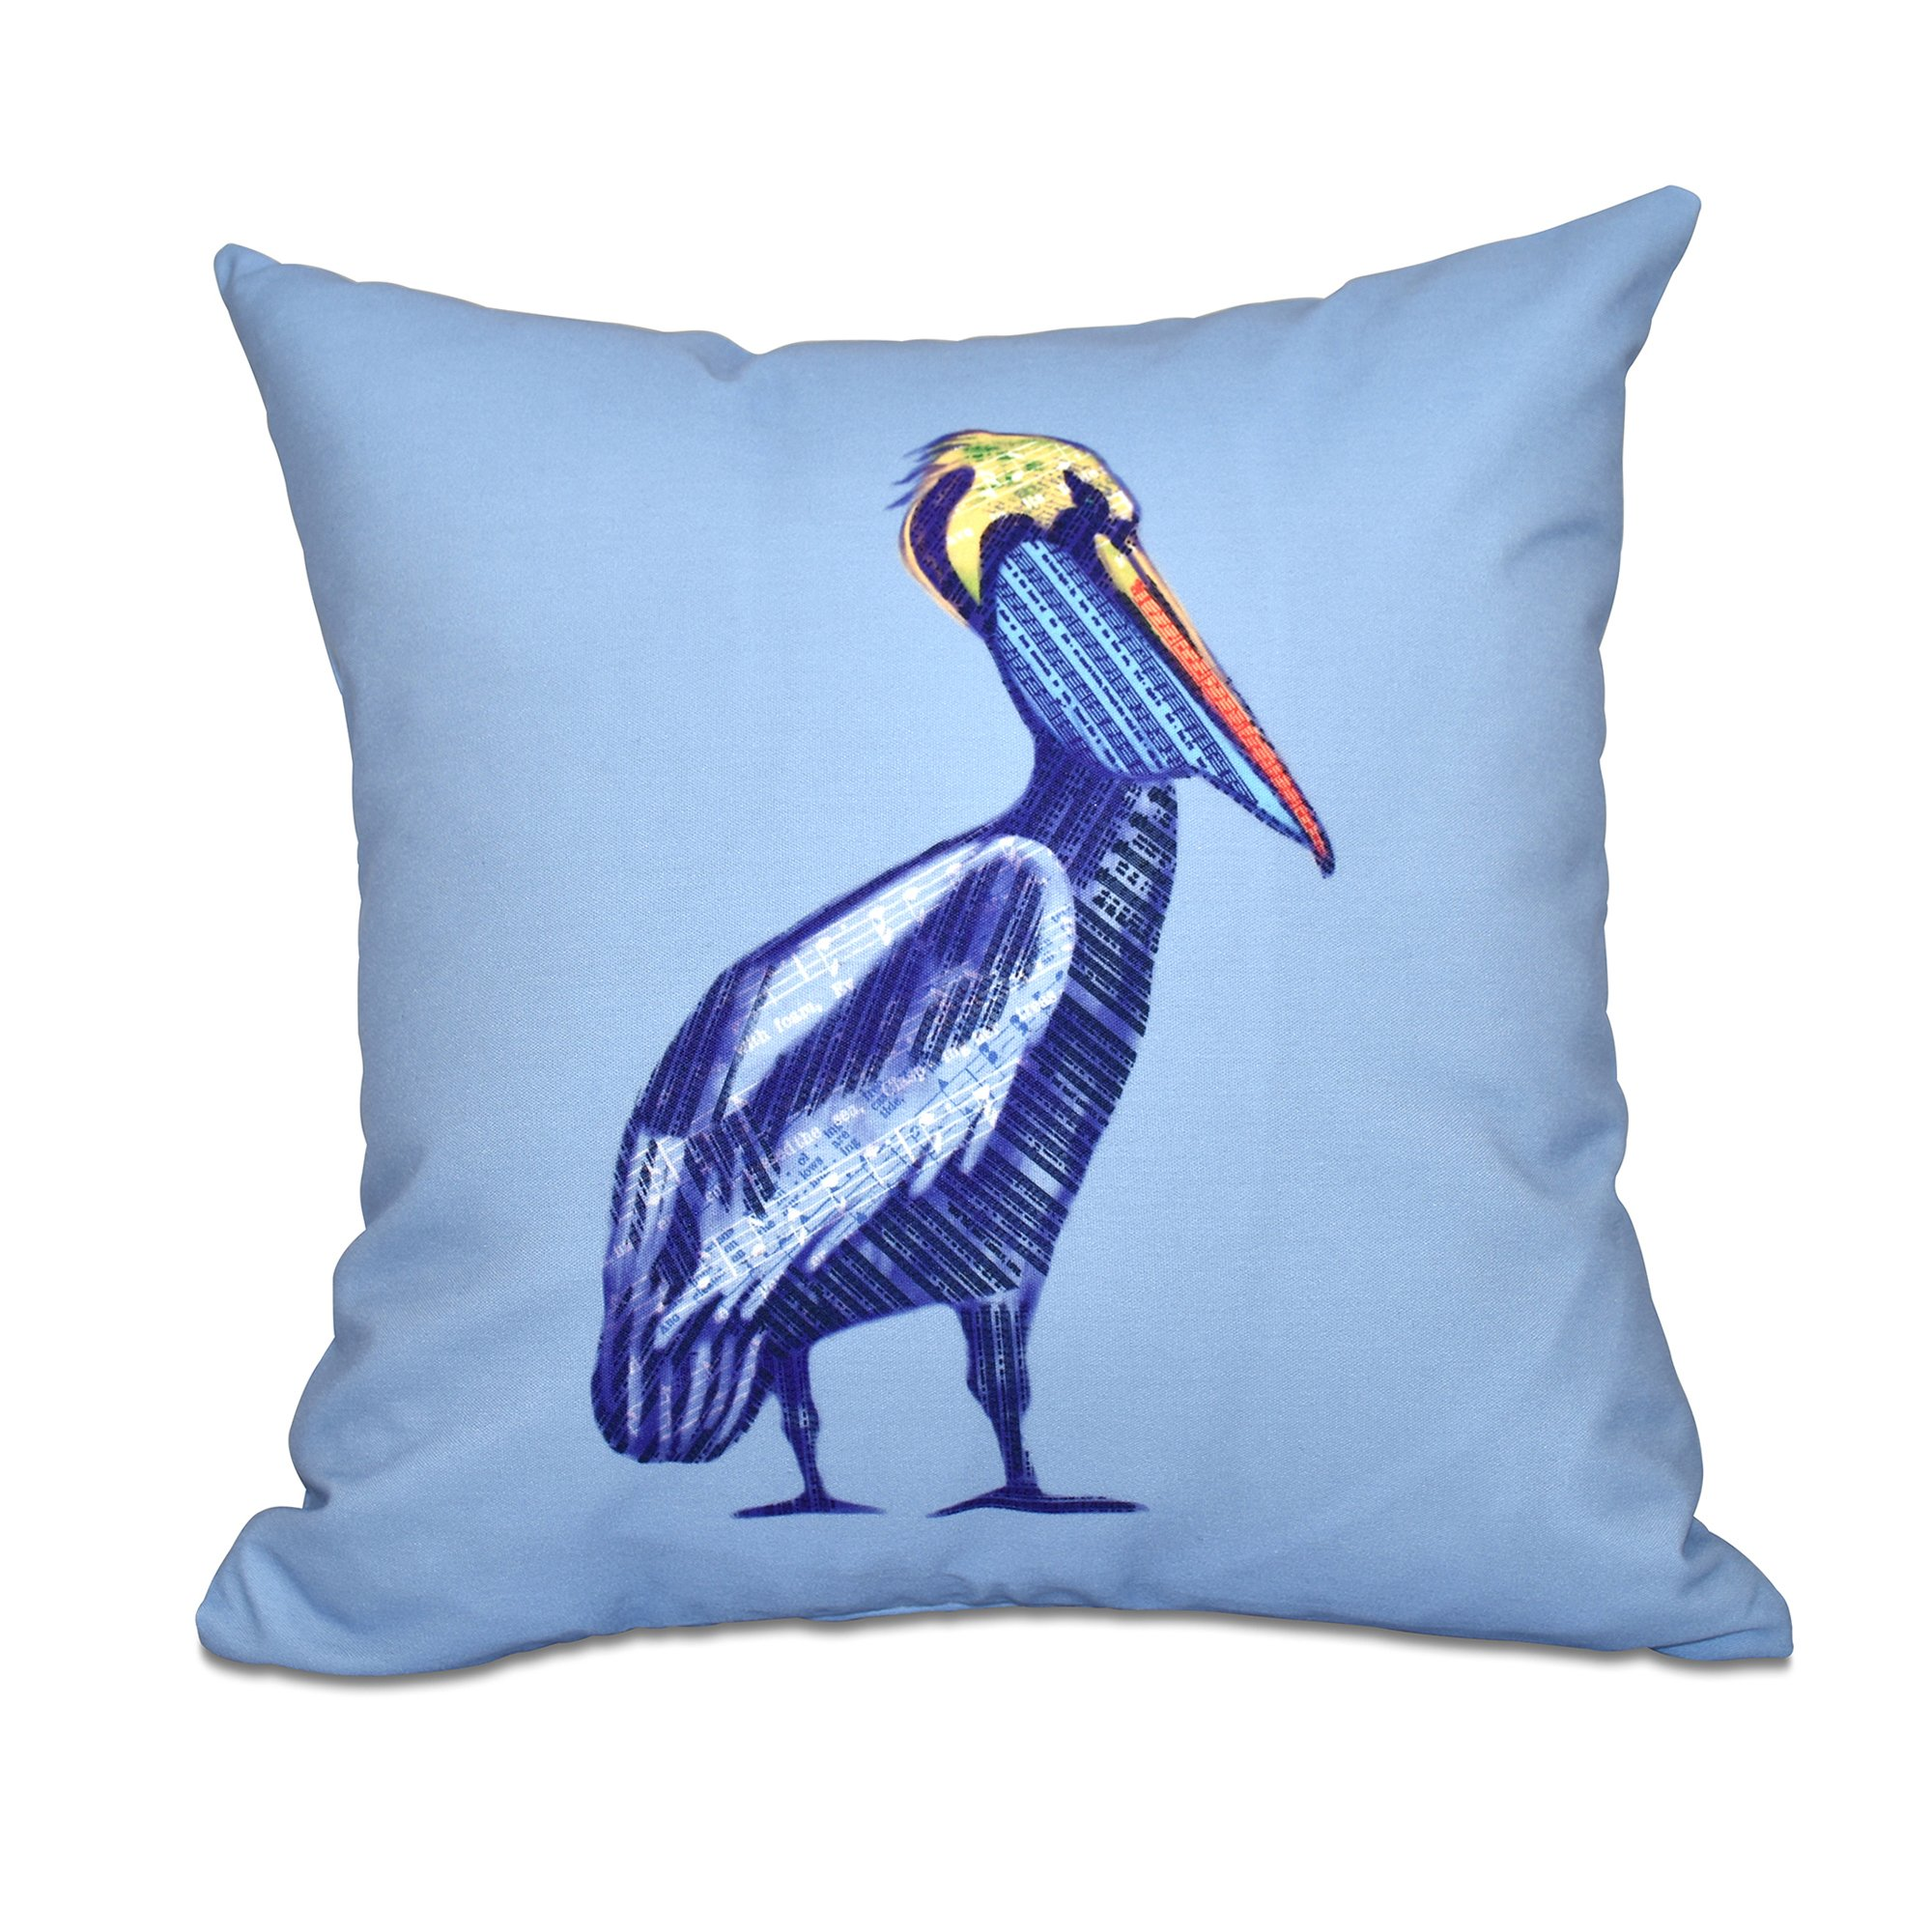 E by design 16 x 16 inch, Sea Music, Animal Print Pillow, Blue